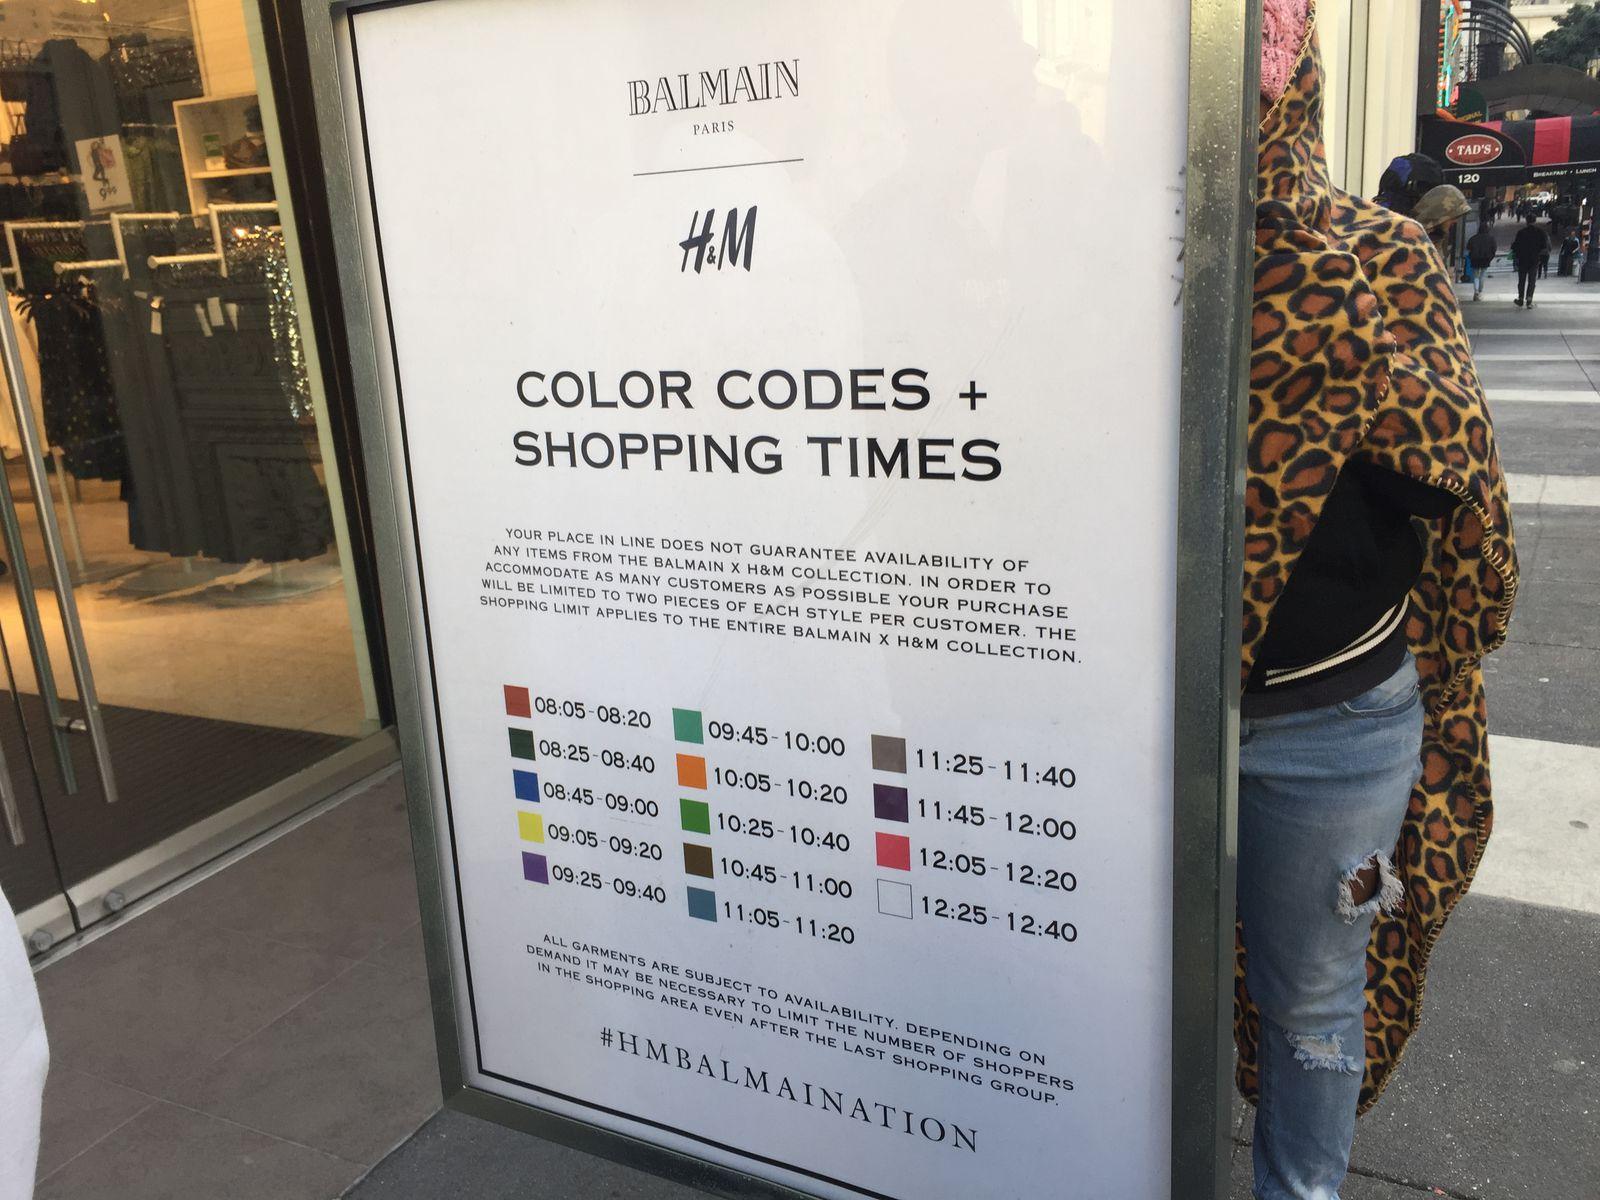 The Balmain x H&M entry time table